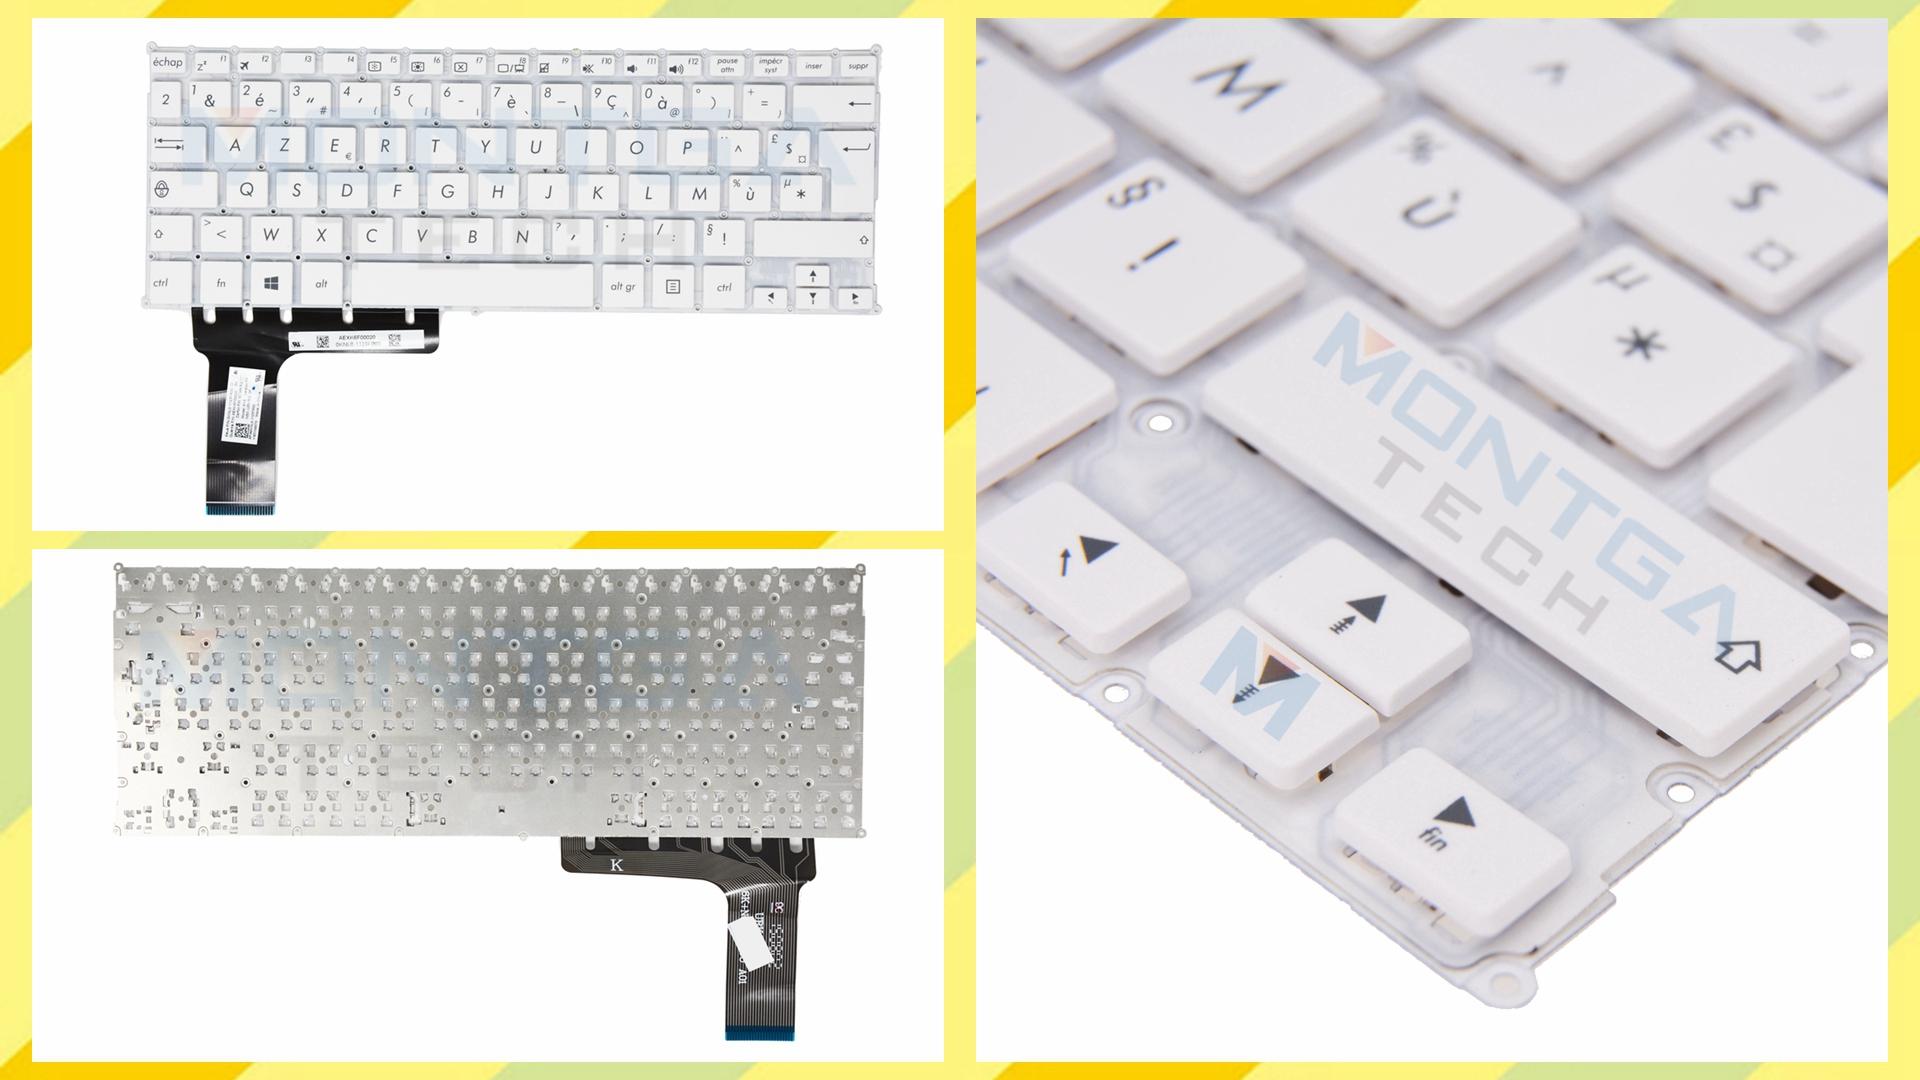 Keyboard Asus, Asus E202 Keyboard, Asus E202 Keyboard AZERTY Français, Asus E202 Blanc Keyboard, Asus 0KNL0-1123FR00 AEXK6F00020, 0KNL0-1123FR00 AEXK6F00020,